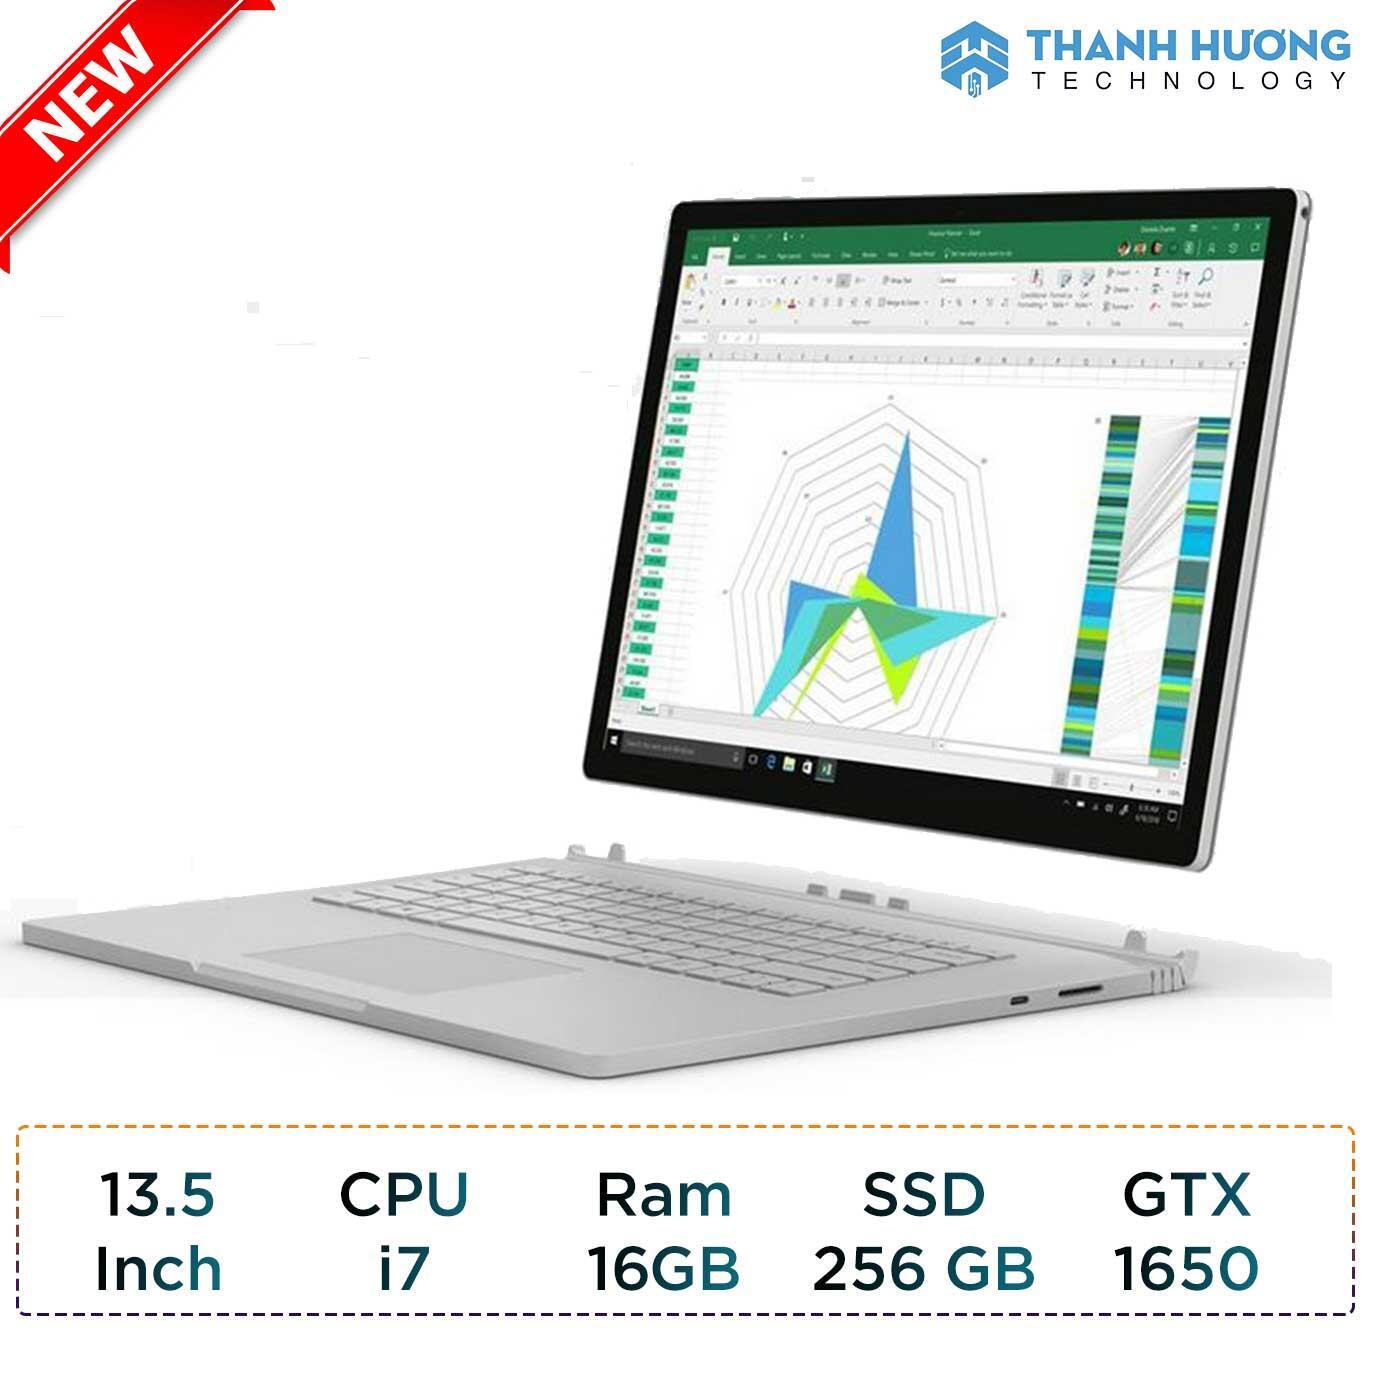 Microsoft Surface Book 3 - 13.5 inch - Core i7 - Ram 16GB - SSD 256GB - GTX 1650 4GB New Seal